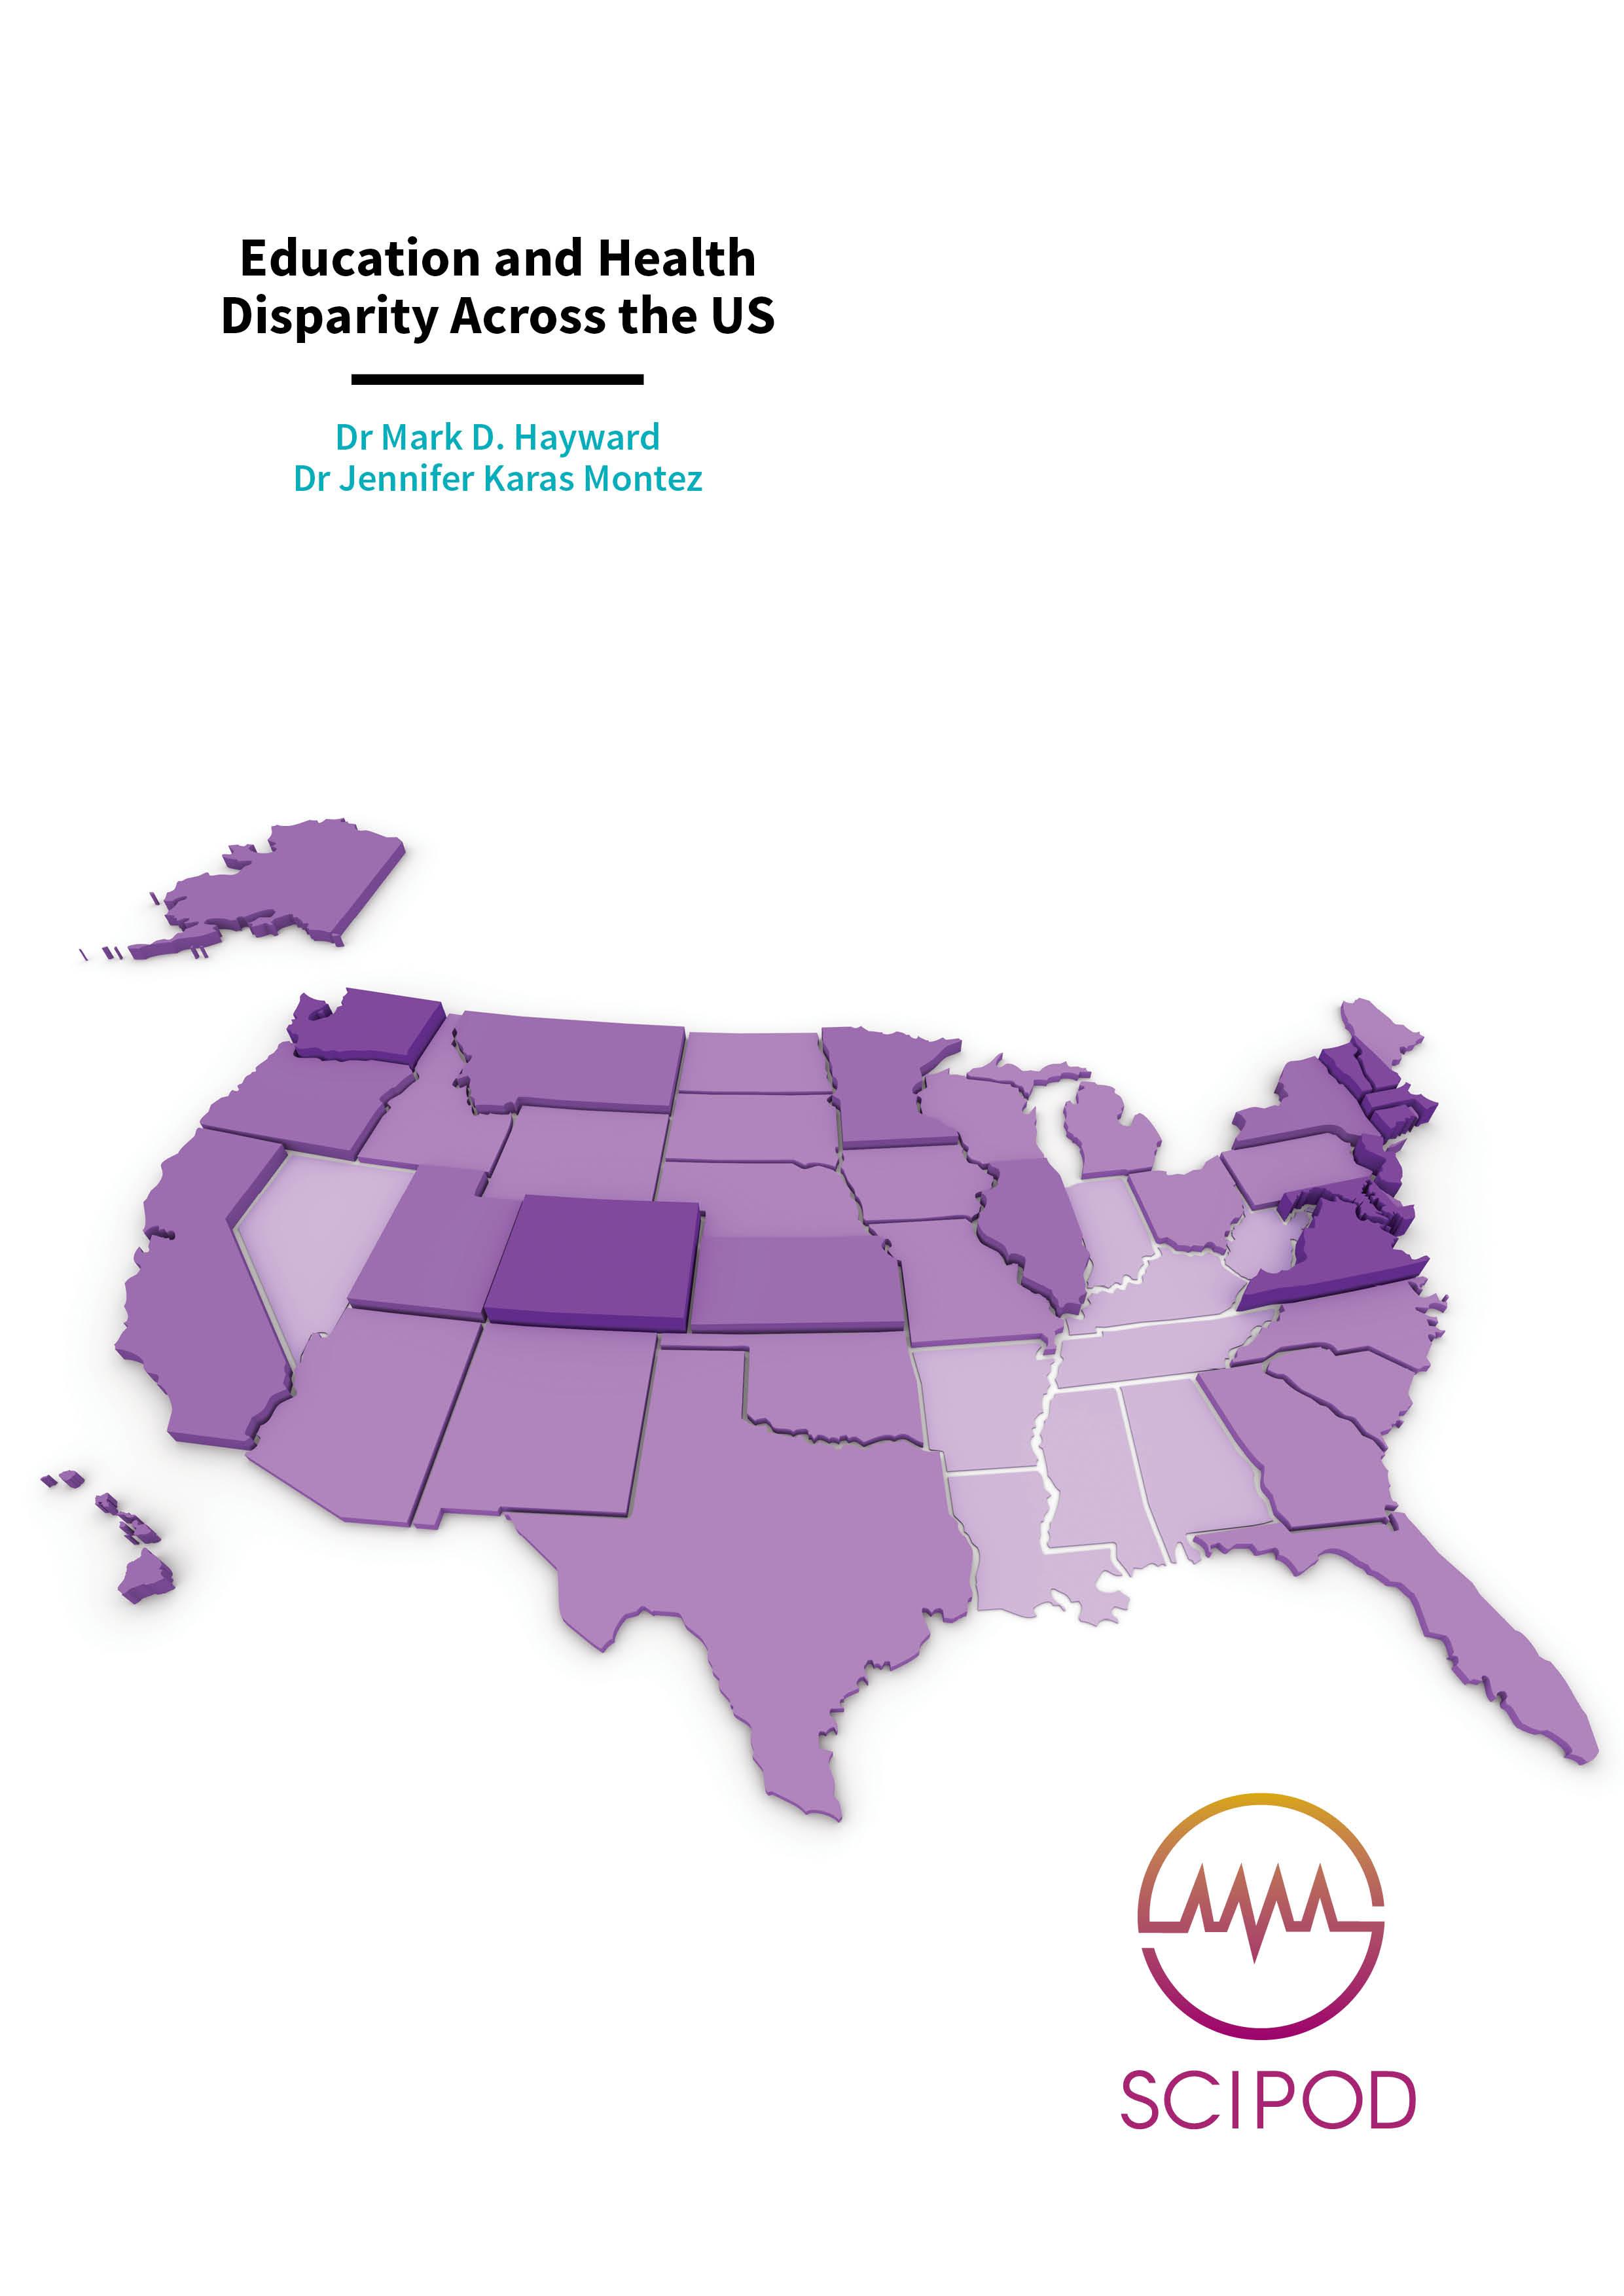 Education and Health Disparity Across the US – Drs Mark D. Hayward & Jennifer Karas Montez